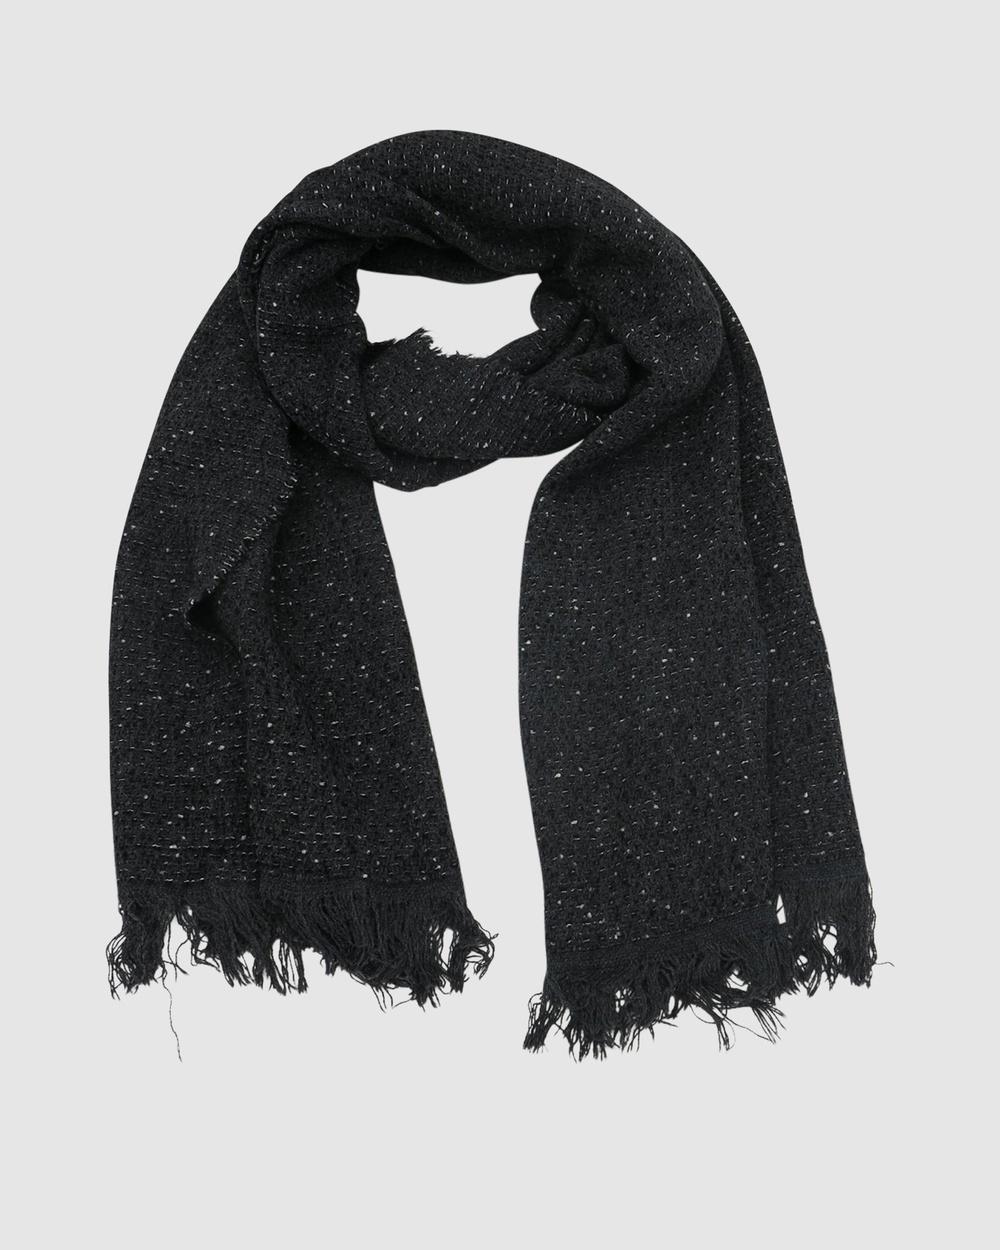 Morgan & Taylor Marianna Scarf Scarves Gloves Black